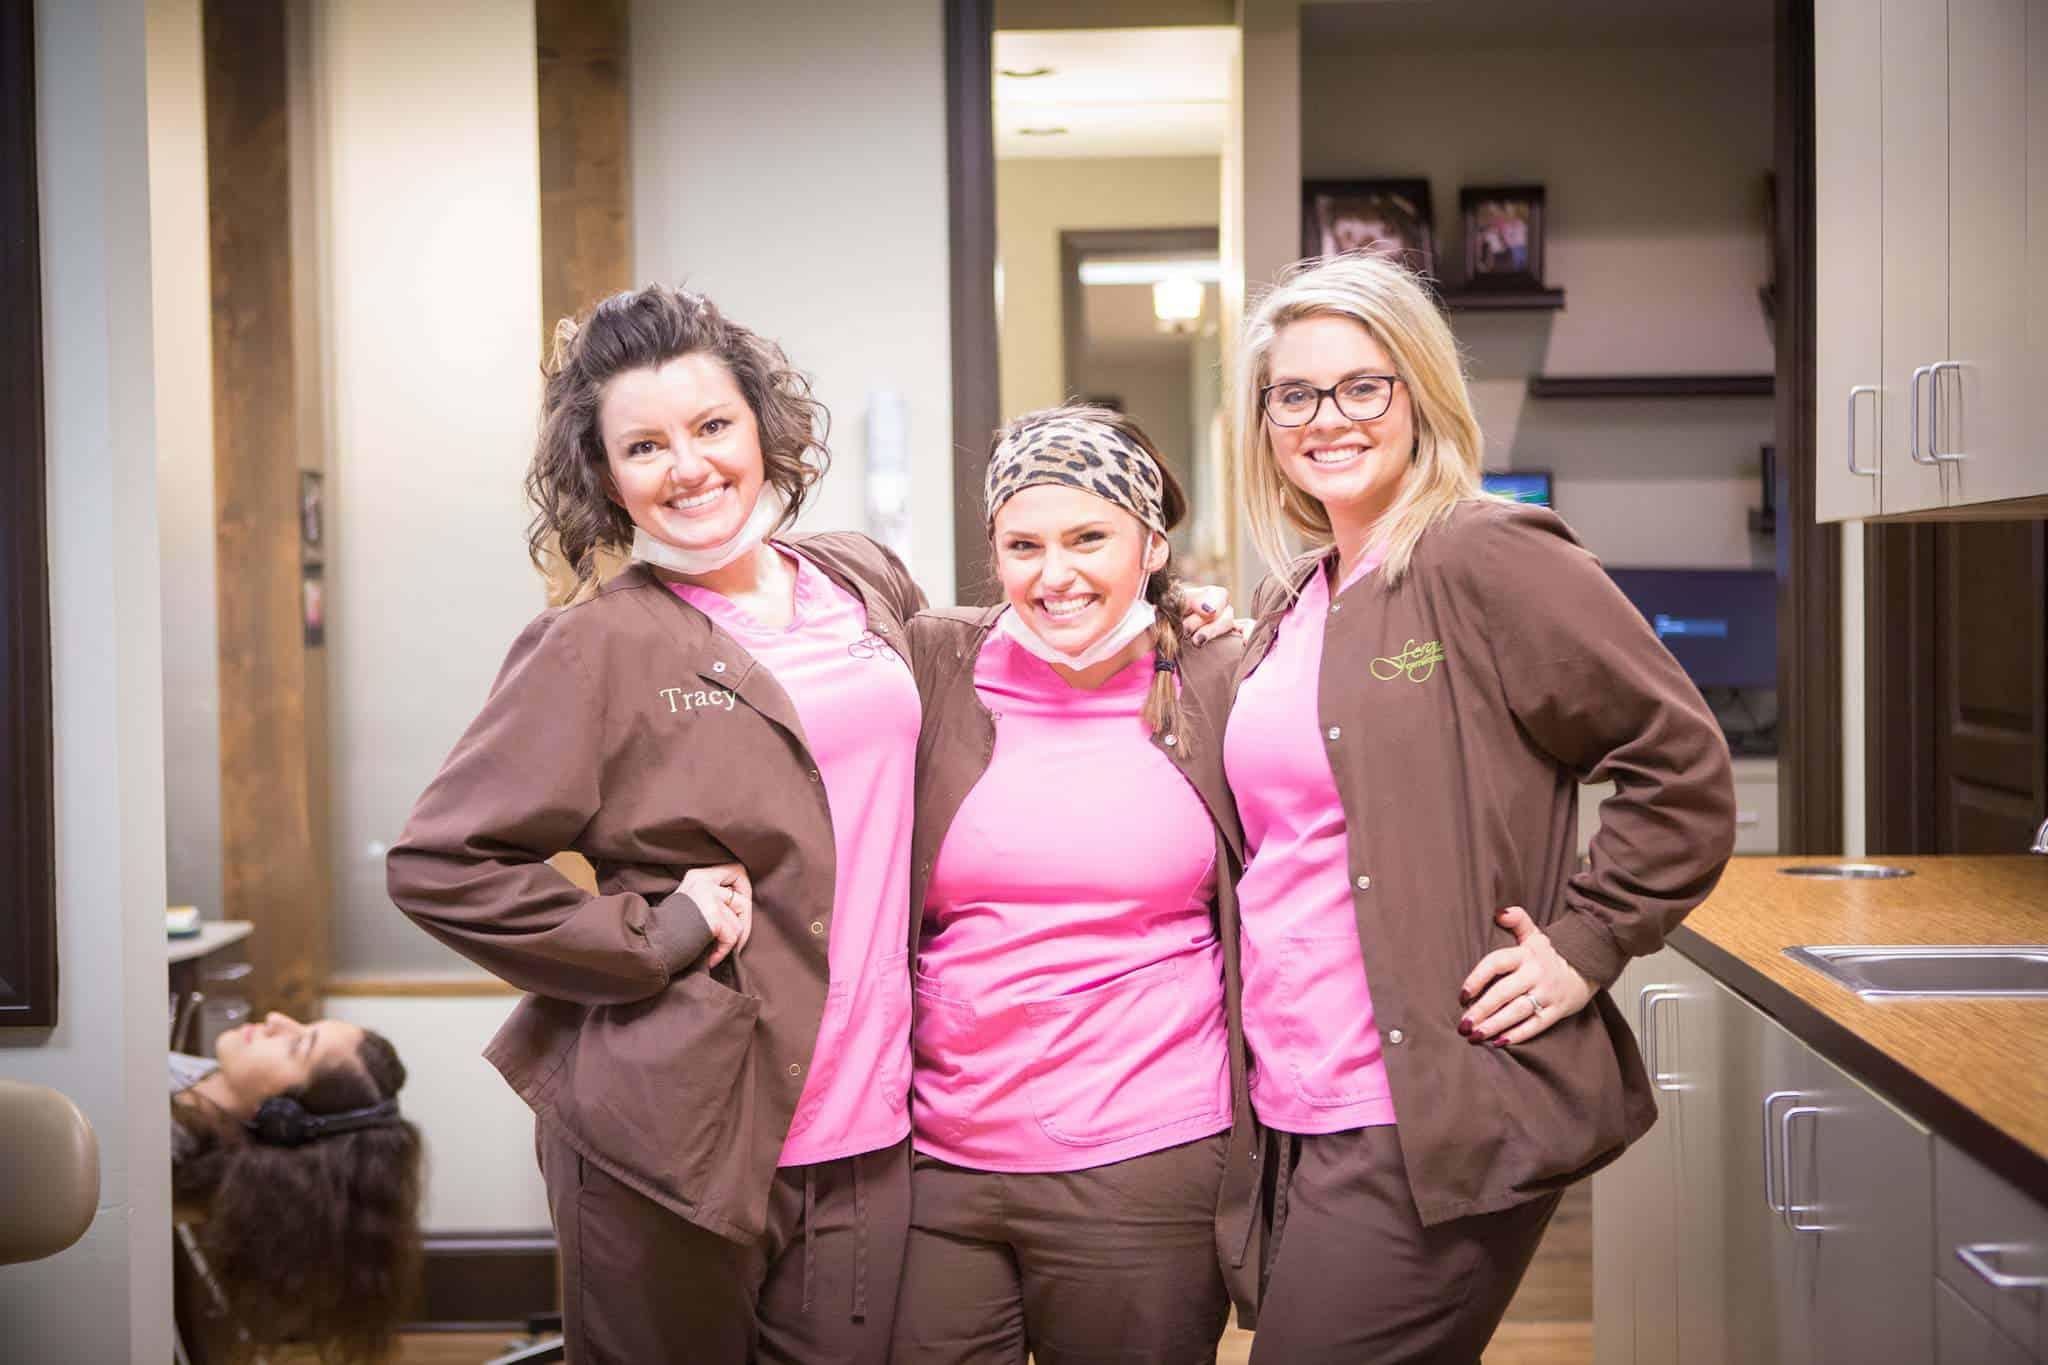 Fergus Orthodontics Jonesboro Arkansas Teams Candids 5 - Meet Your Orthodontic Team